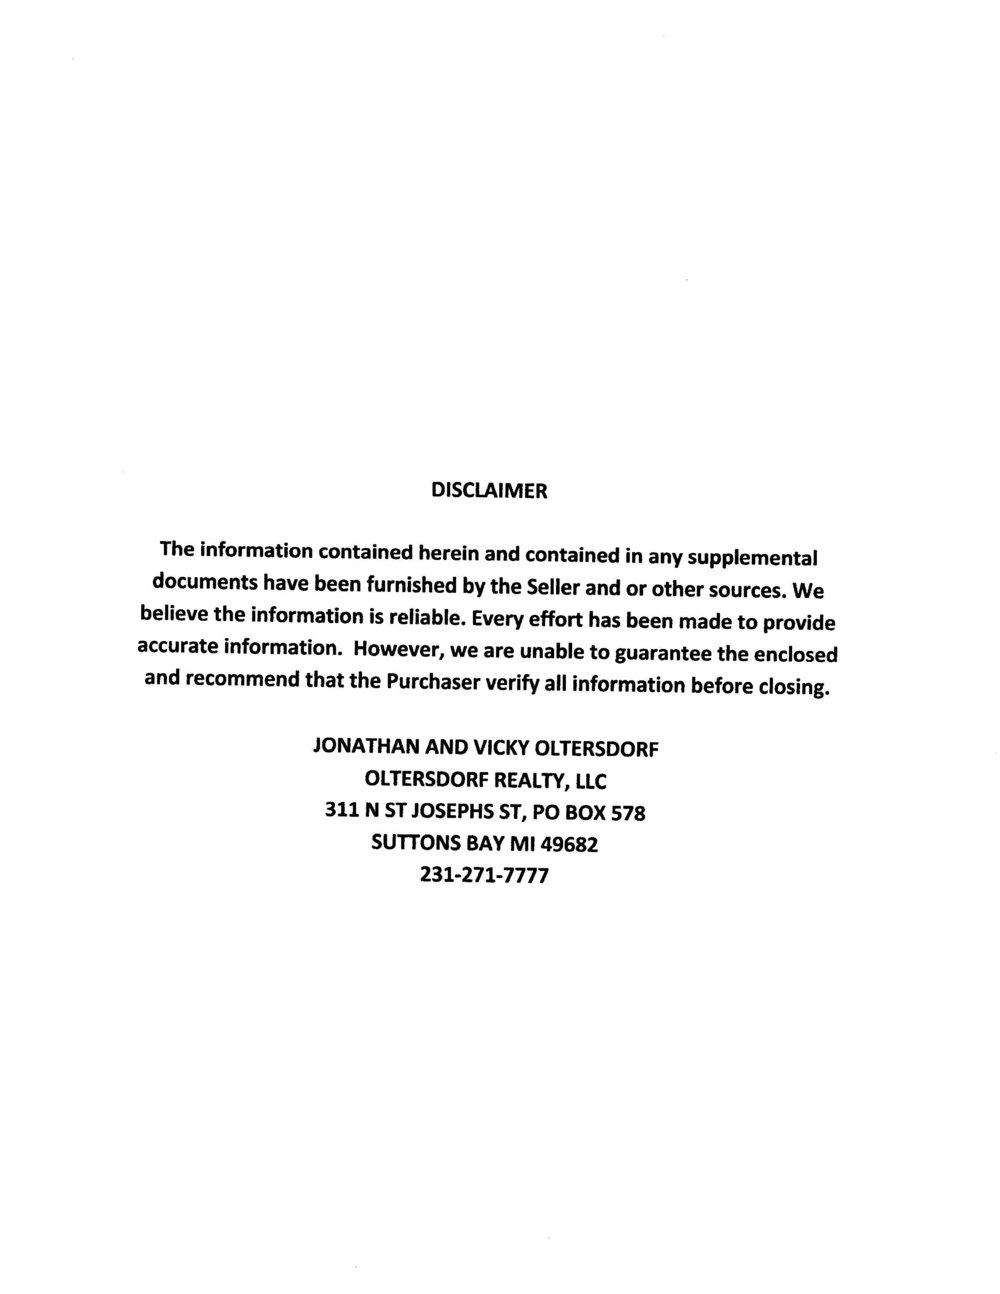 11635 E Belanger Woods Dr Marketing Packet - For Sale by Oltersdorf Realty LLC (43).jpg